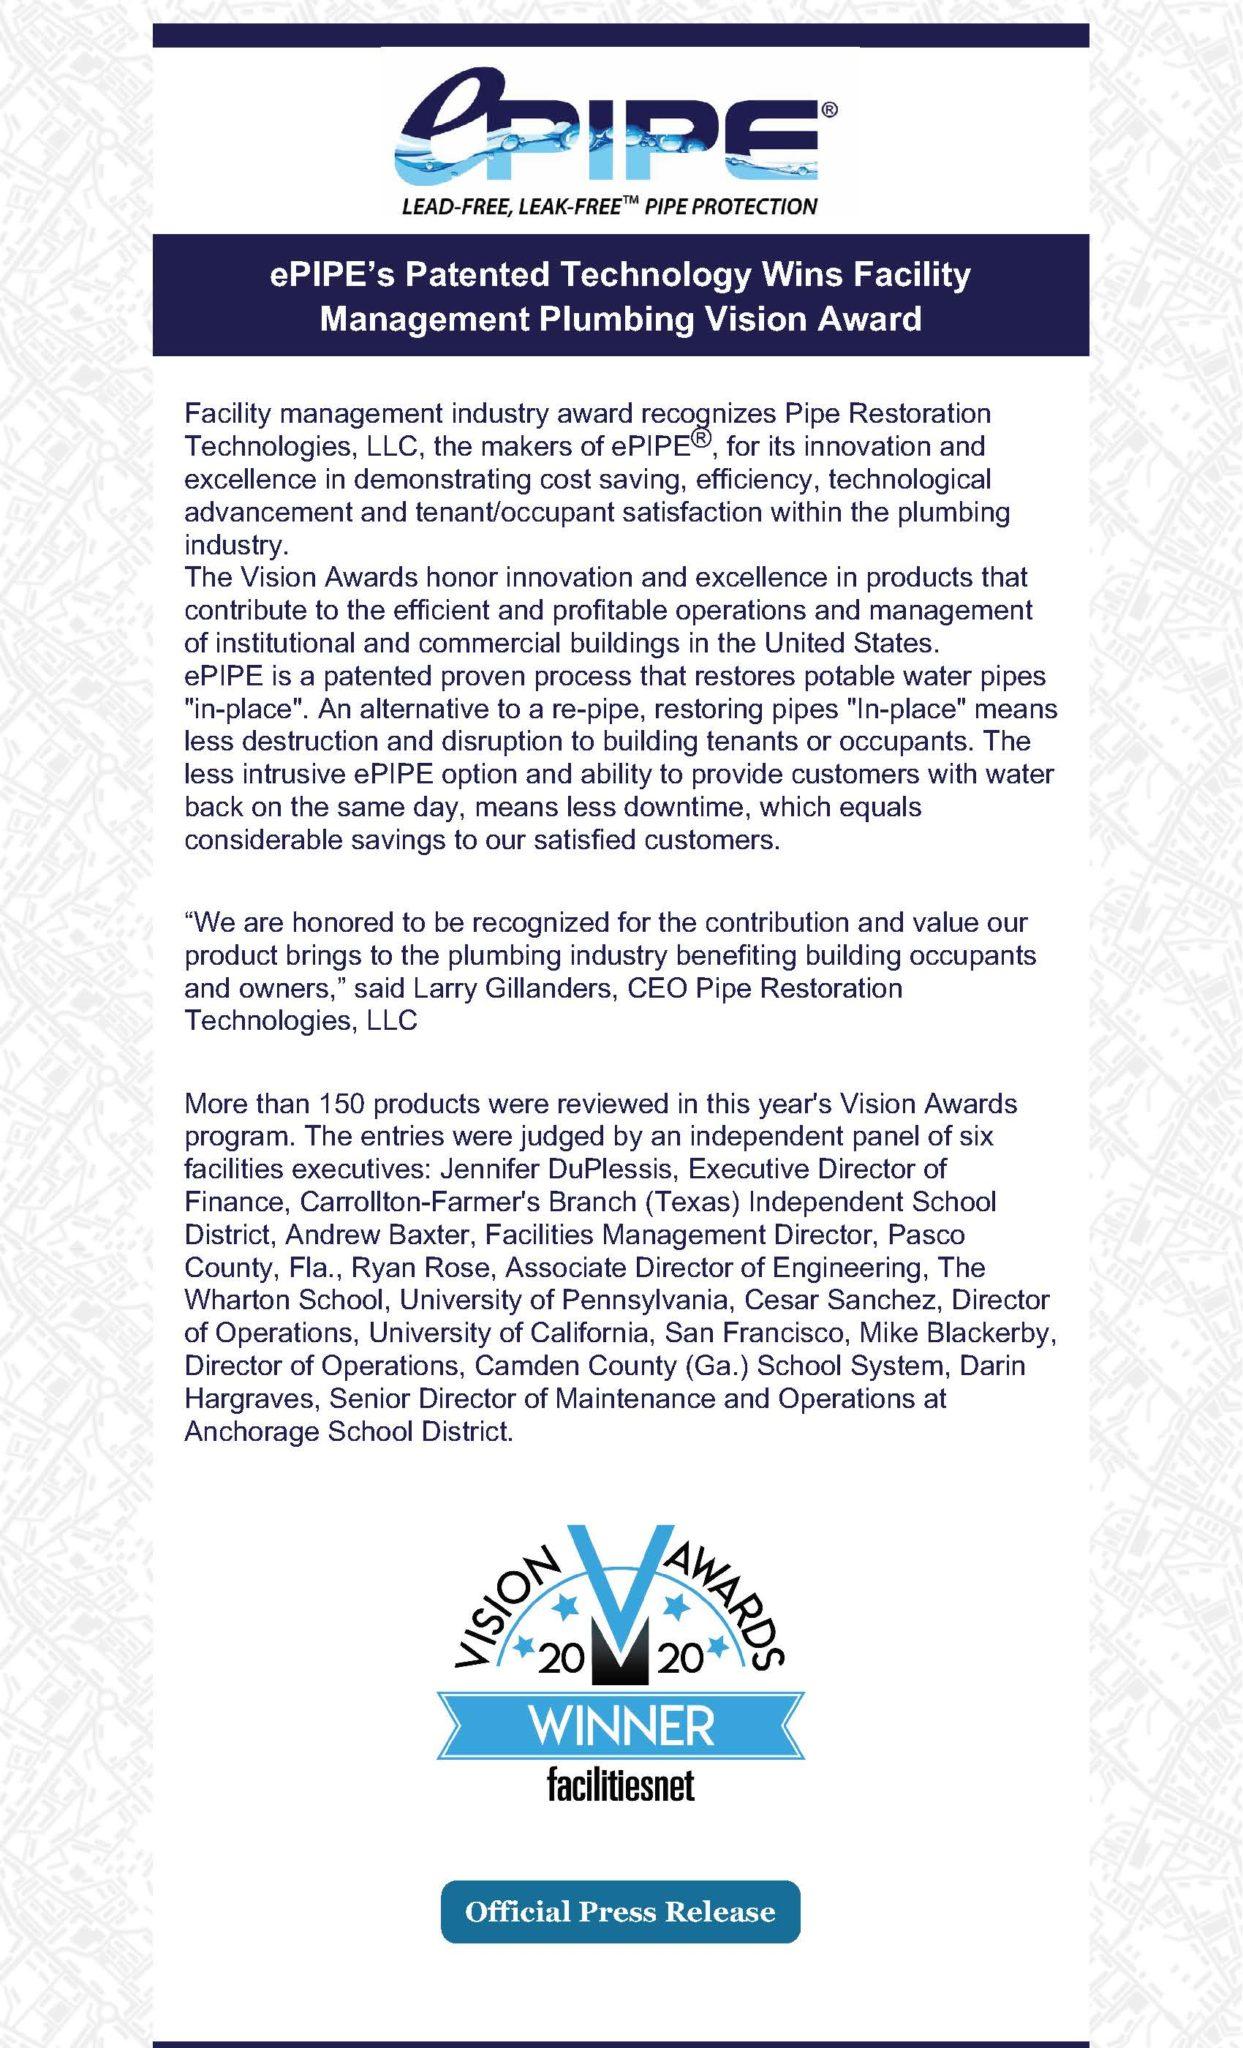 ePIPE Vision Award Press Release